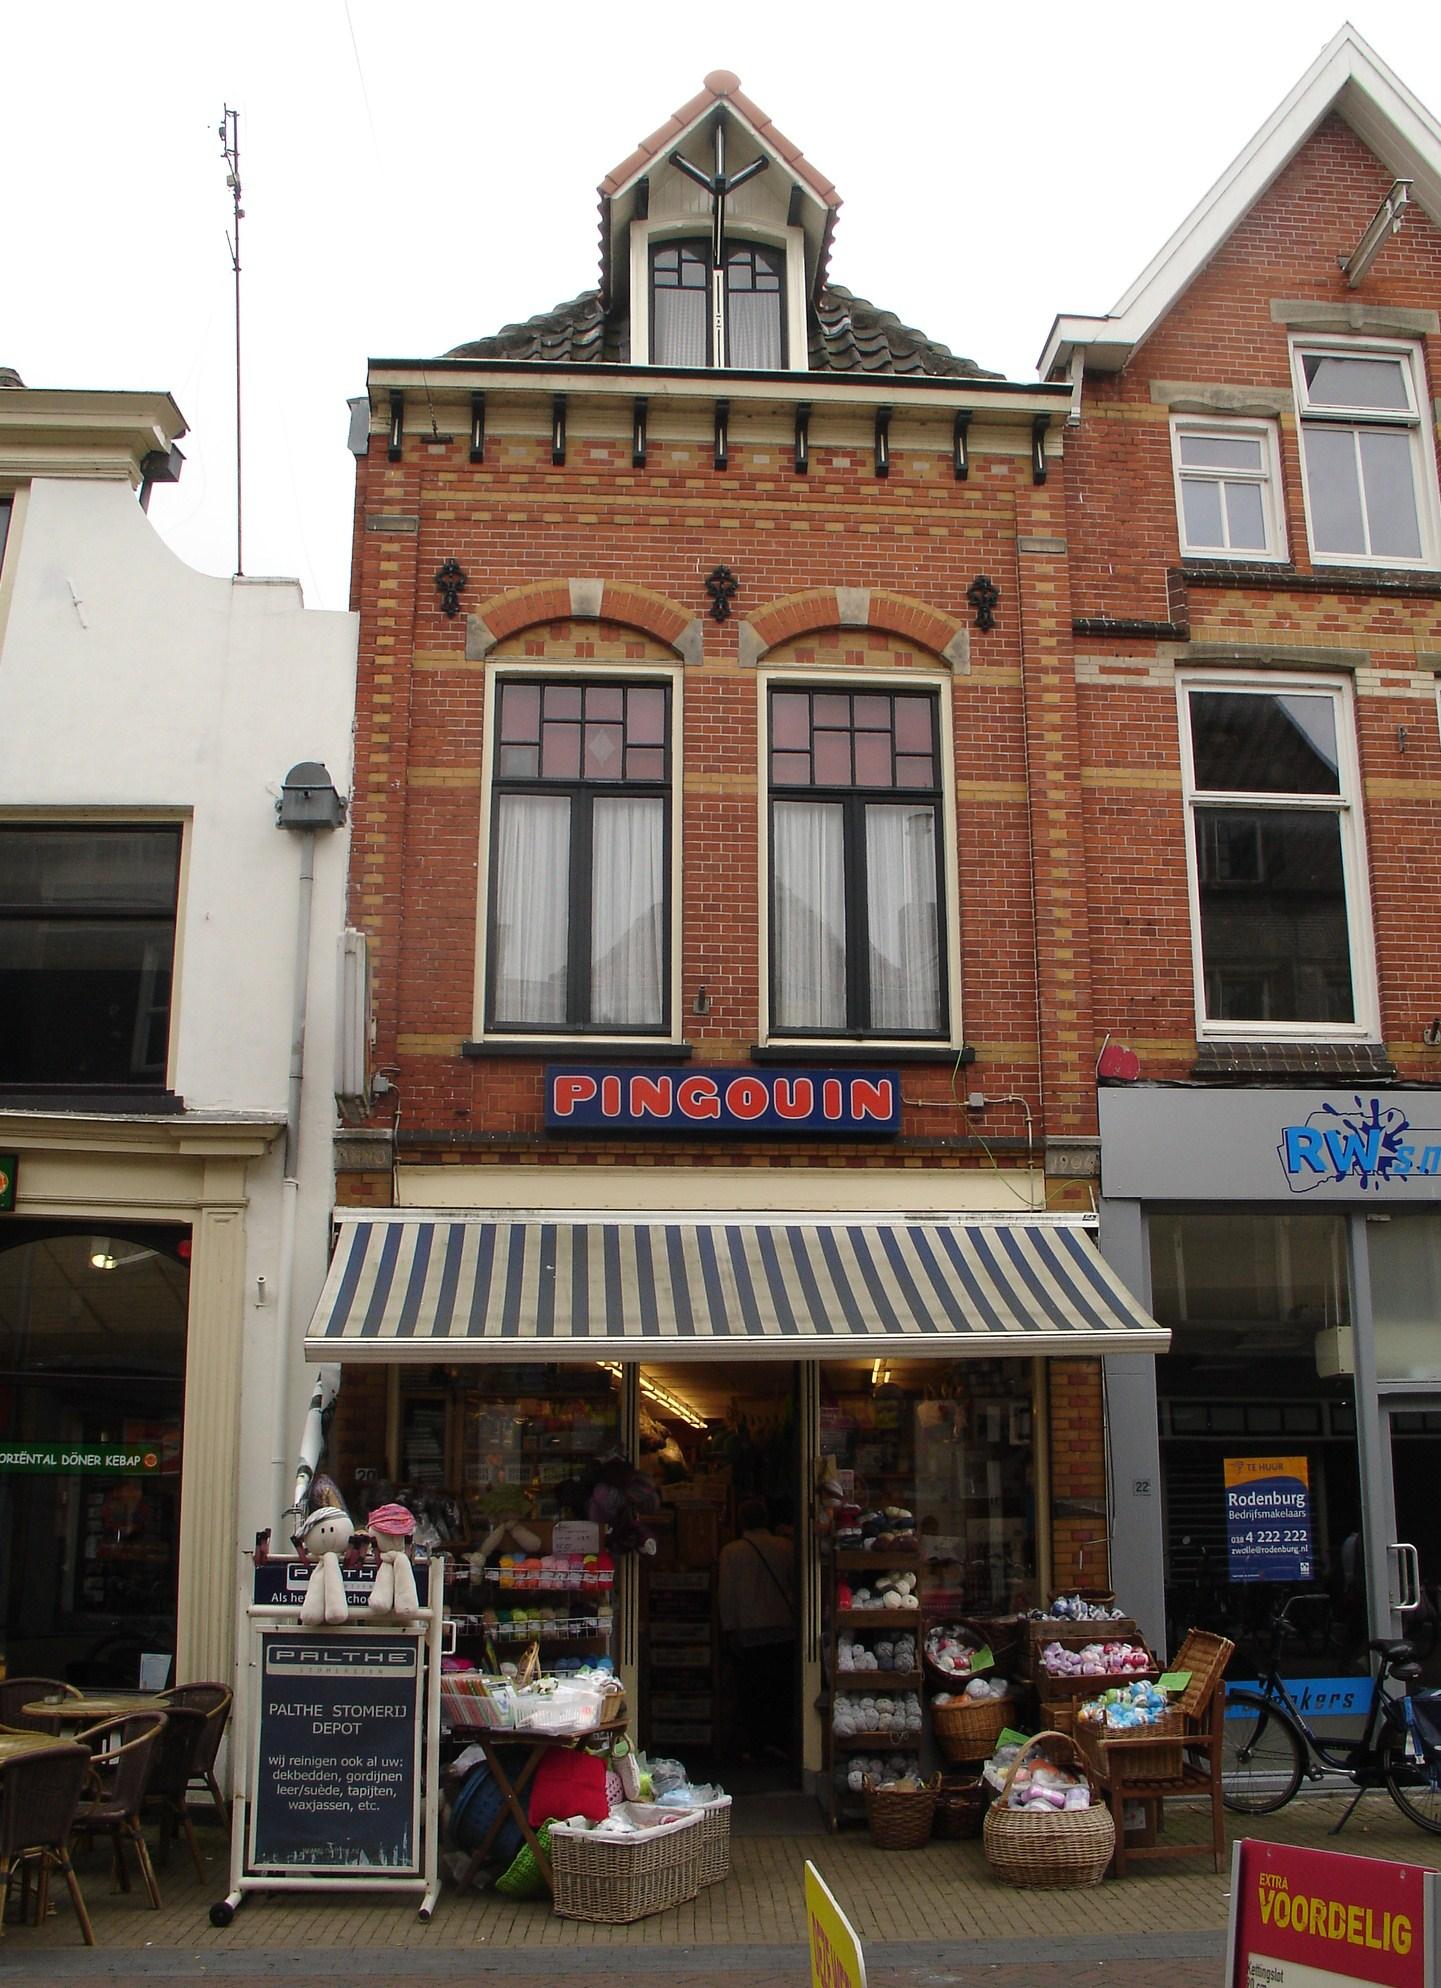 https://upload.wikimedia.org/wikipedia/commons/9/9b/Oudestraat_20%2C_Kampen.jpg